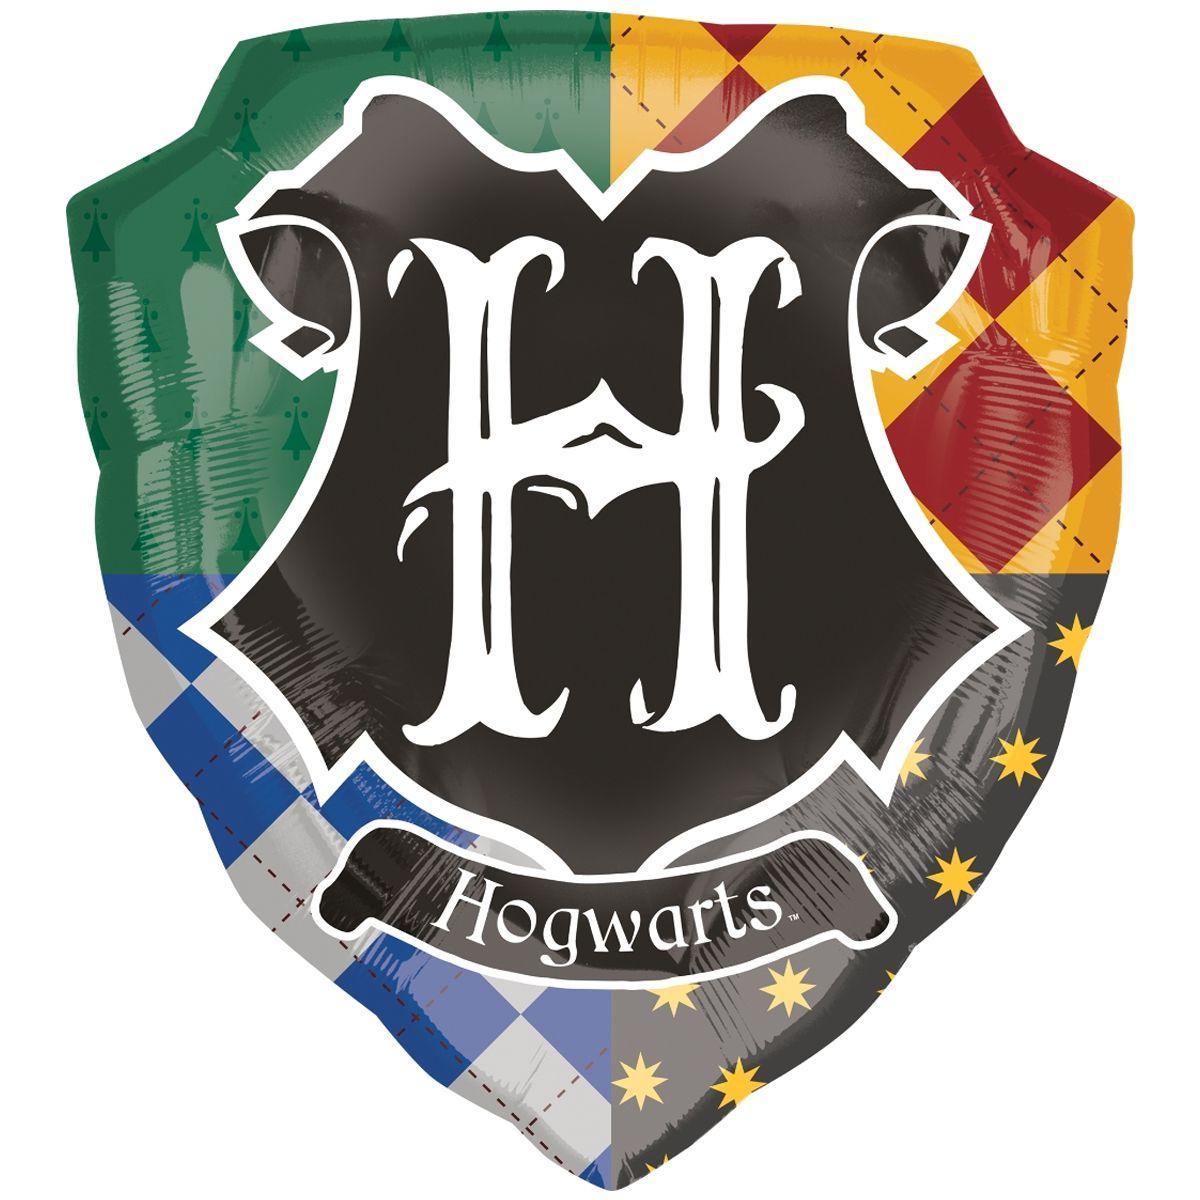 Фольгированный шар Гарри Поттер герб хогвартса, 68х63 см